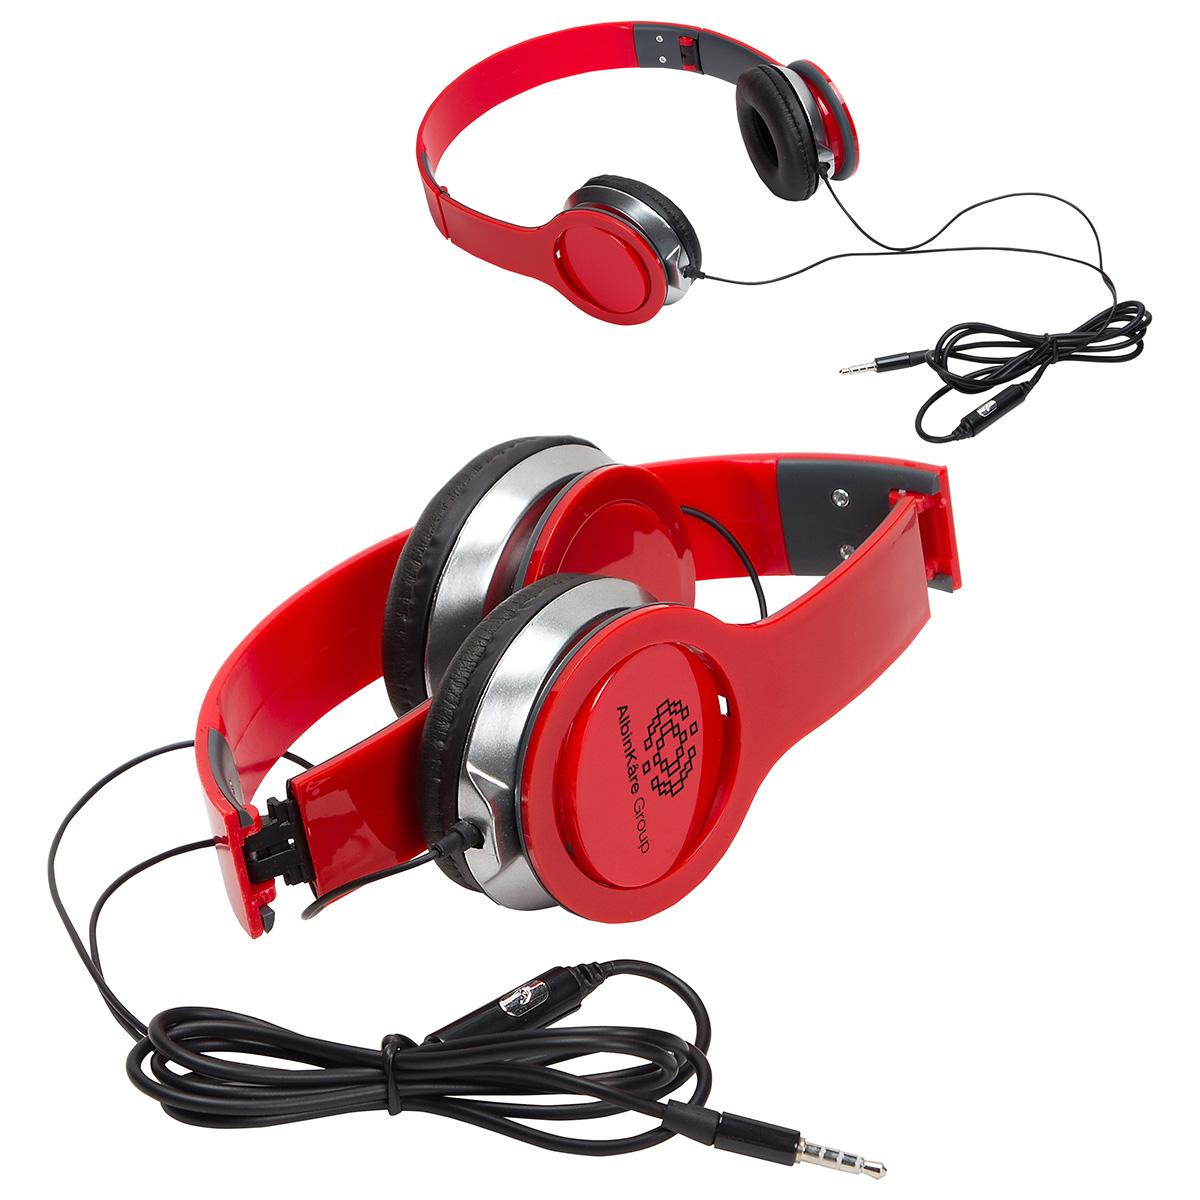 Moji Foldable Headphones with Mic, WTV-MF16, 1 Colour Imprint